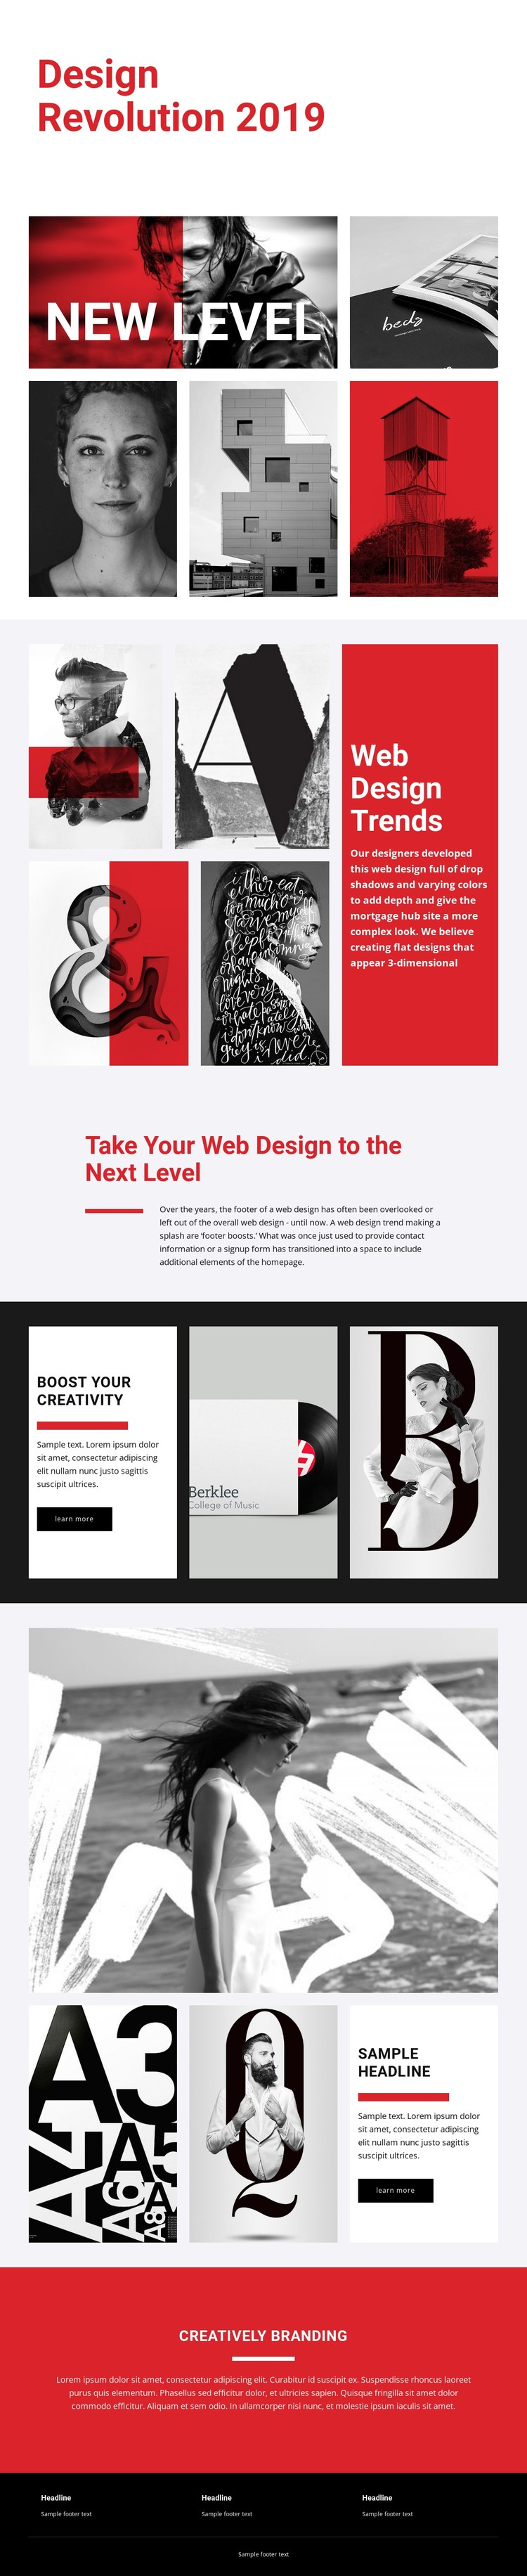 Revolution of designing art CSS Template